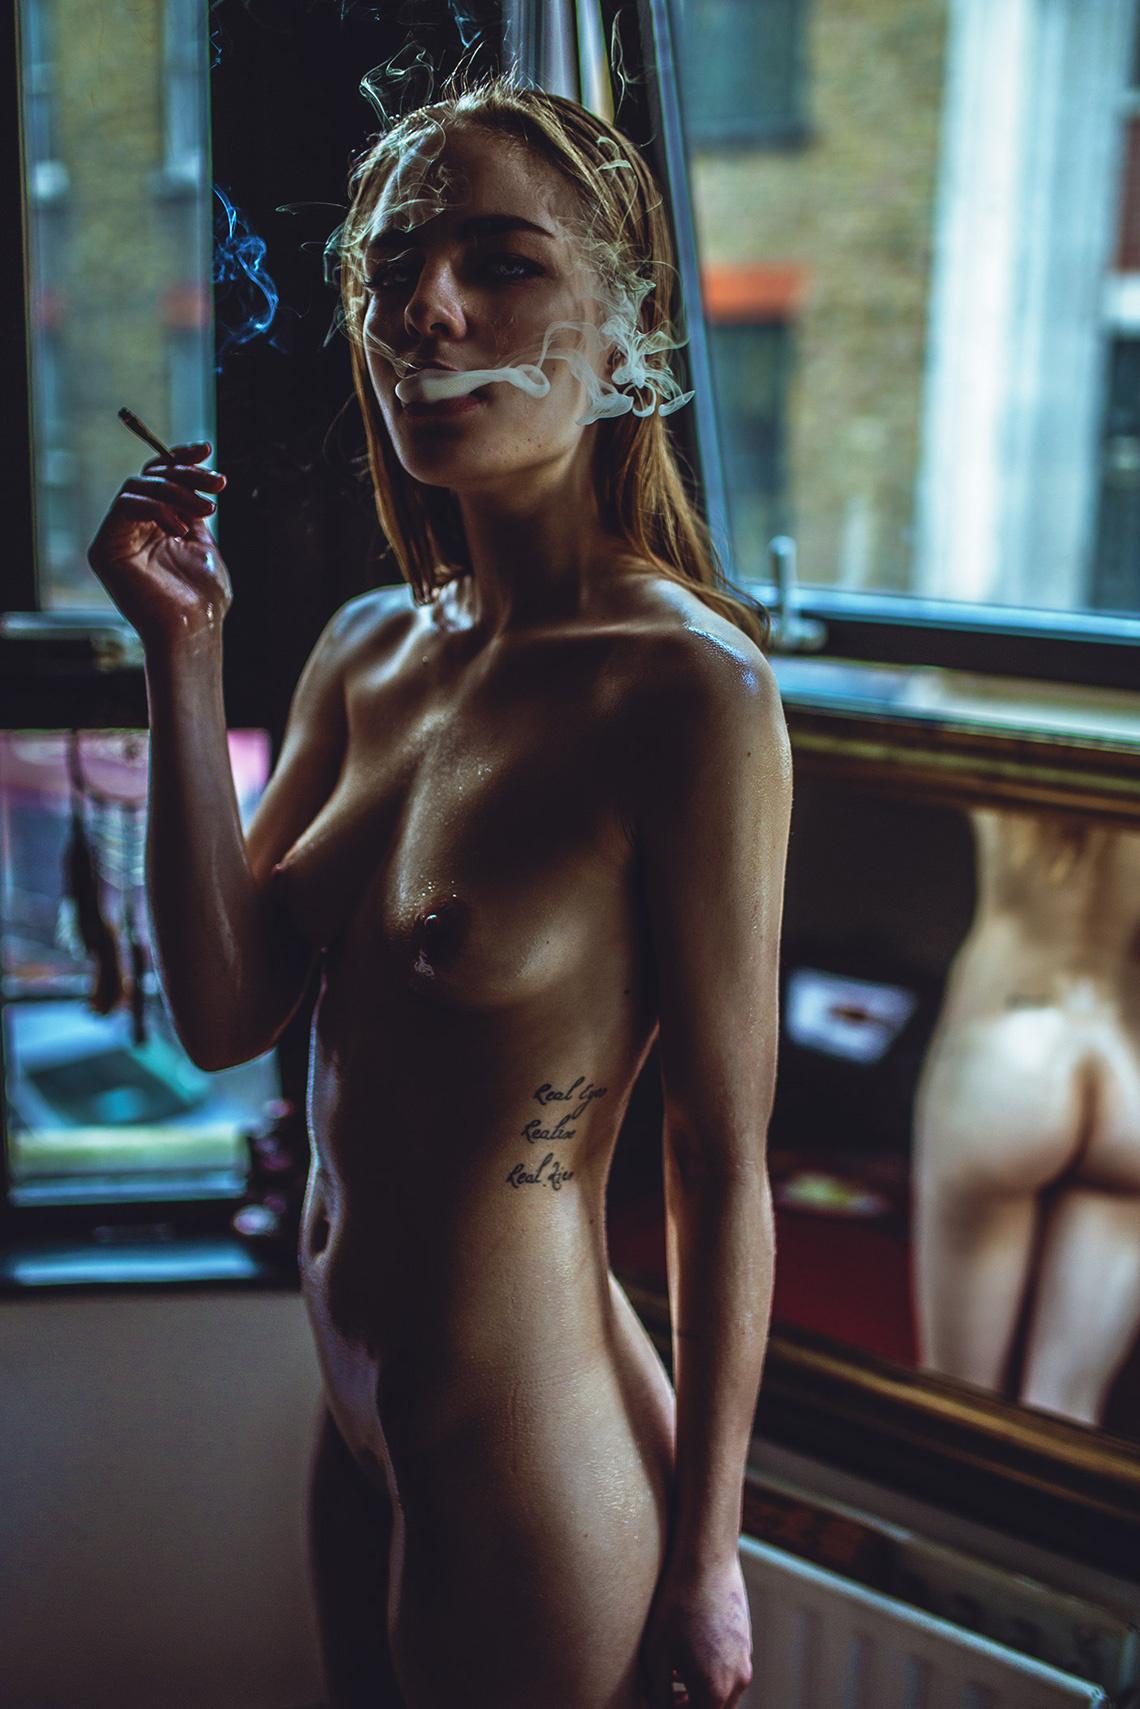 Alicia Jade – Smoke and Mirrors / фото Haris Nukem